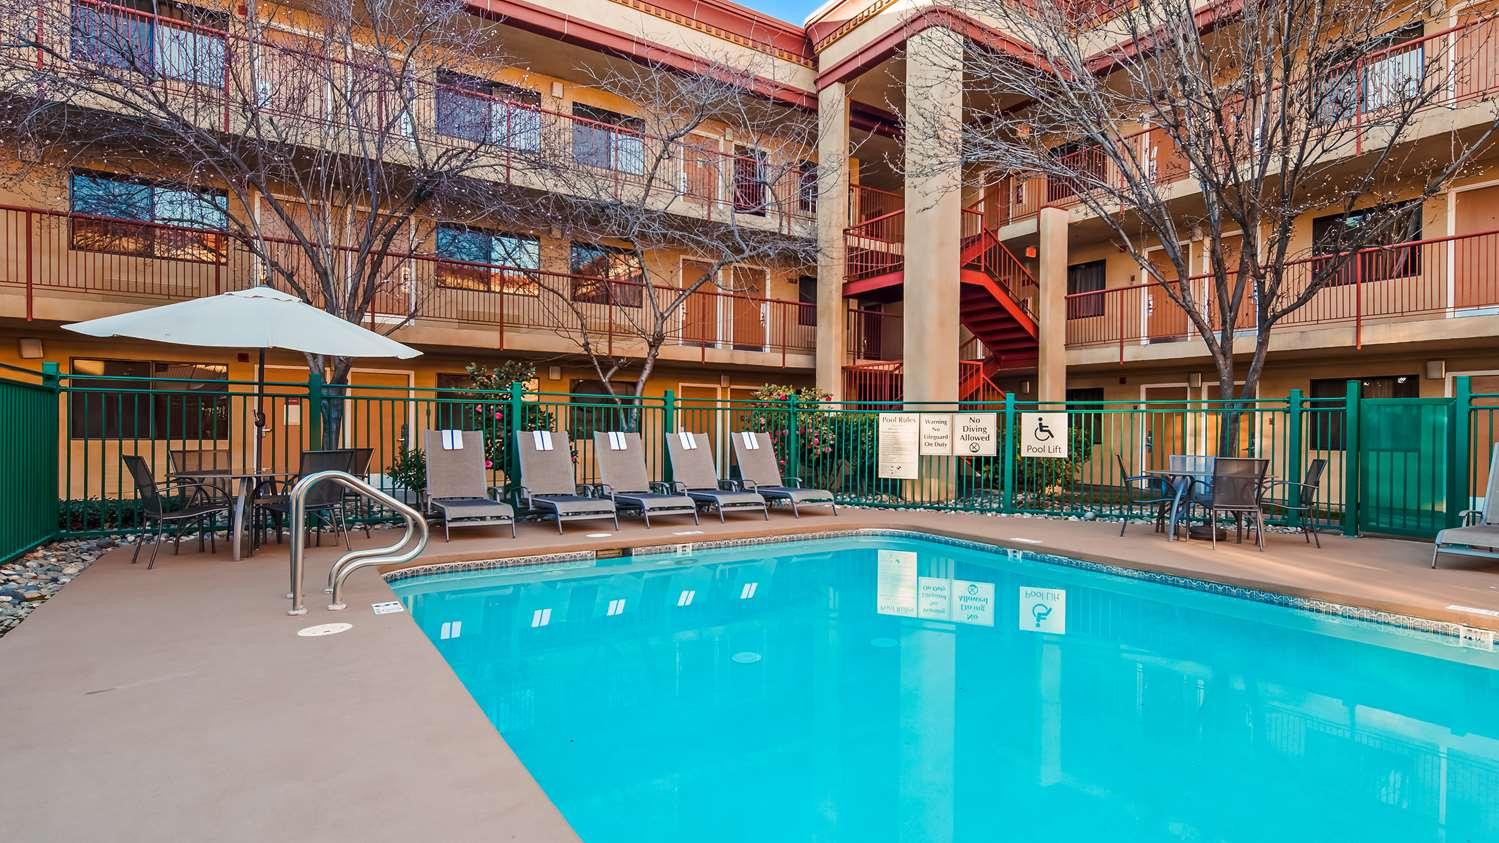 Pool - Best Western Plus Orchid Hotel & Suites Roseville